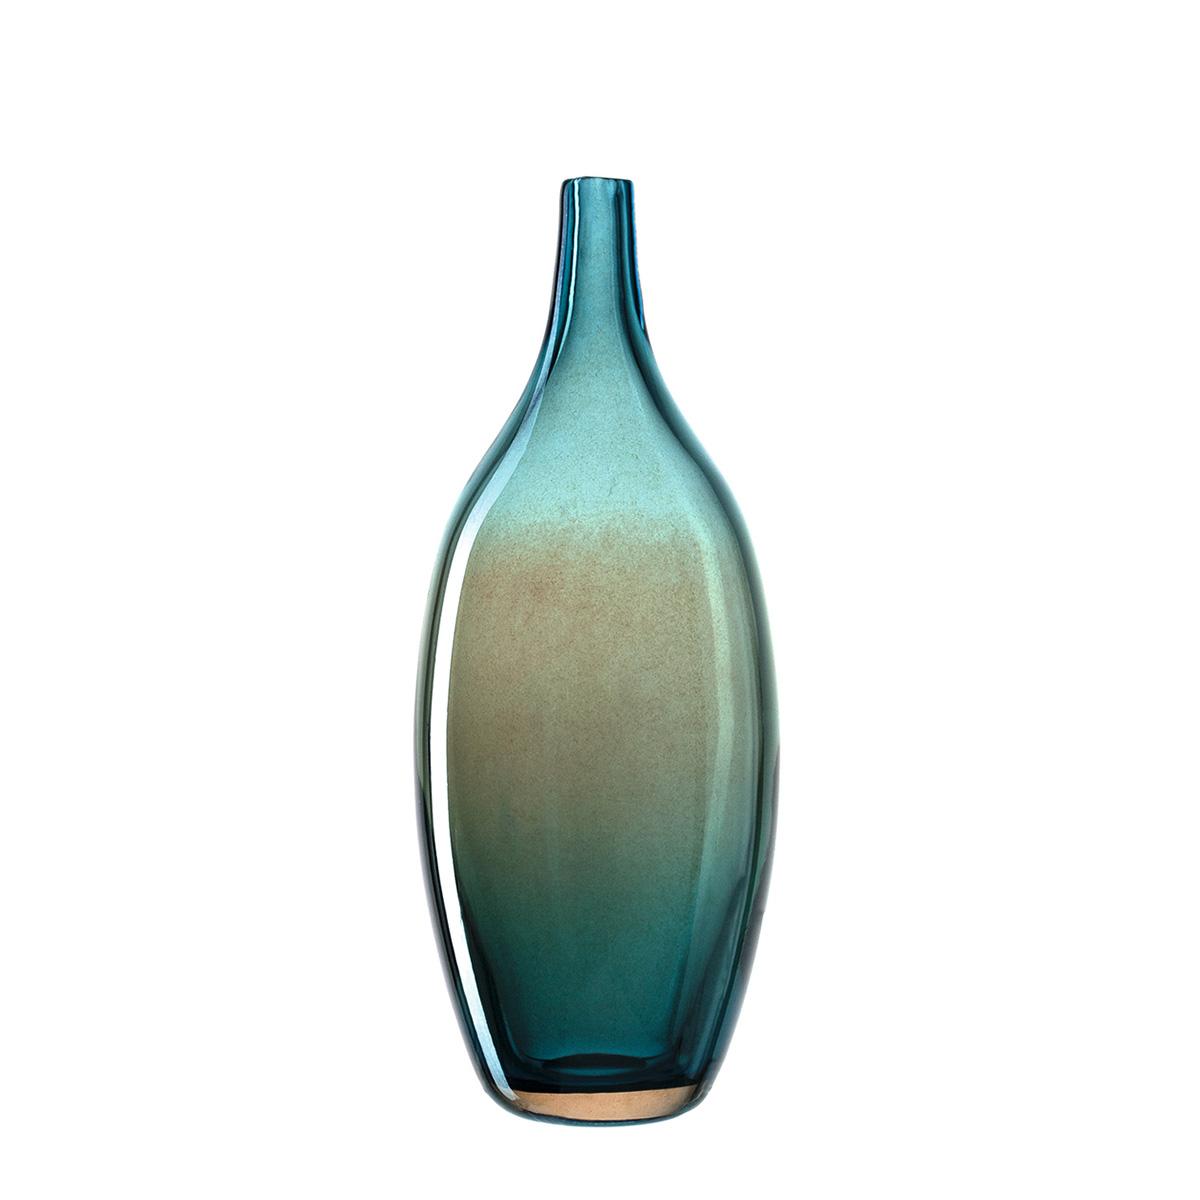 Vaza Lucente 20815